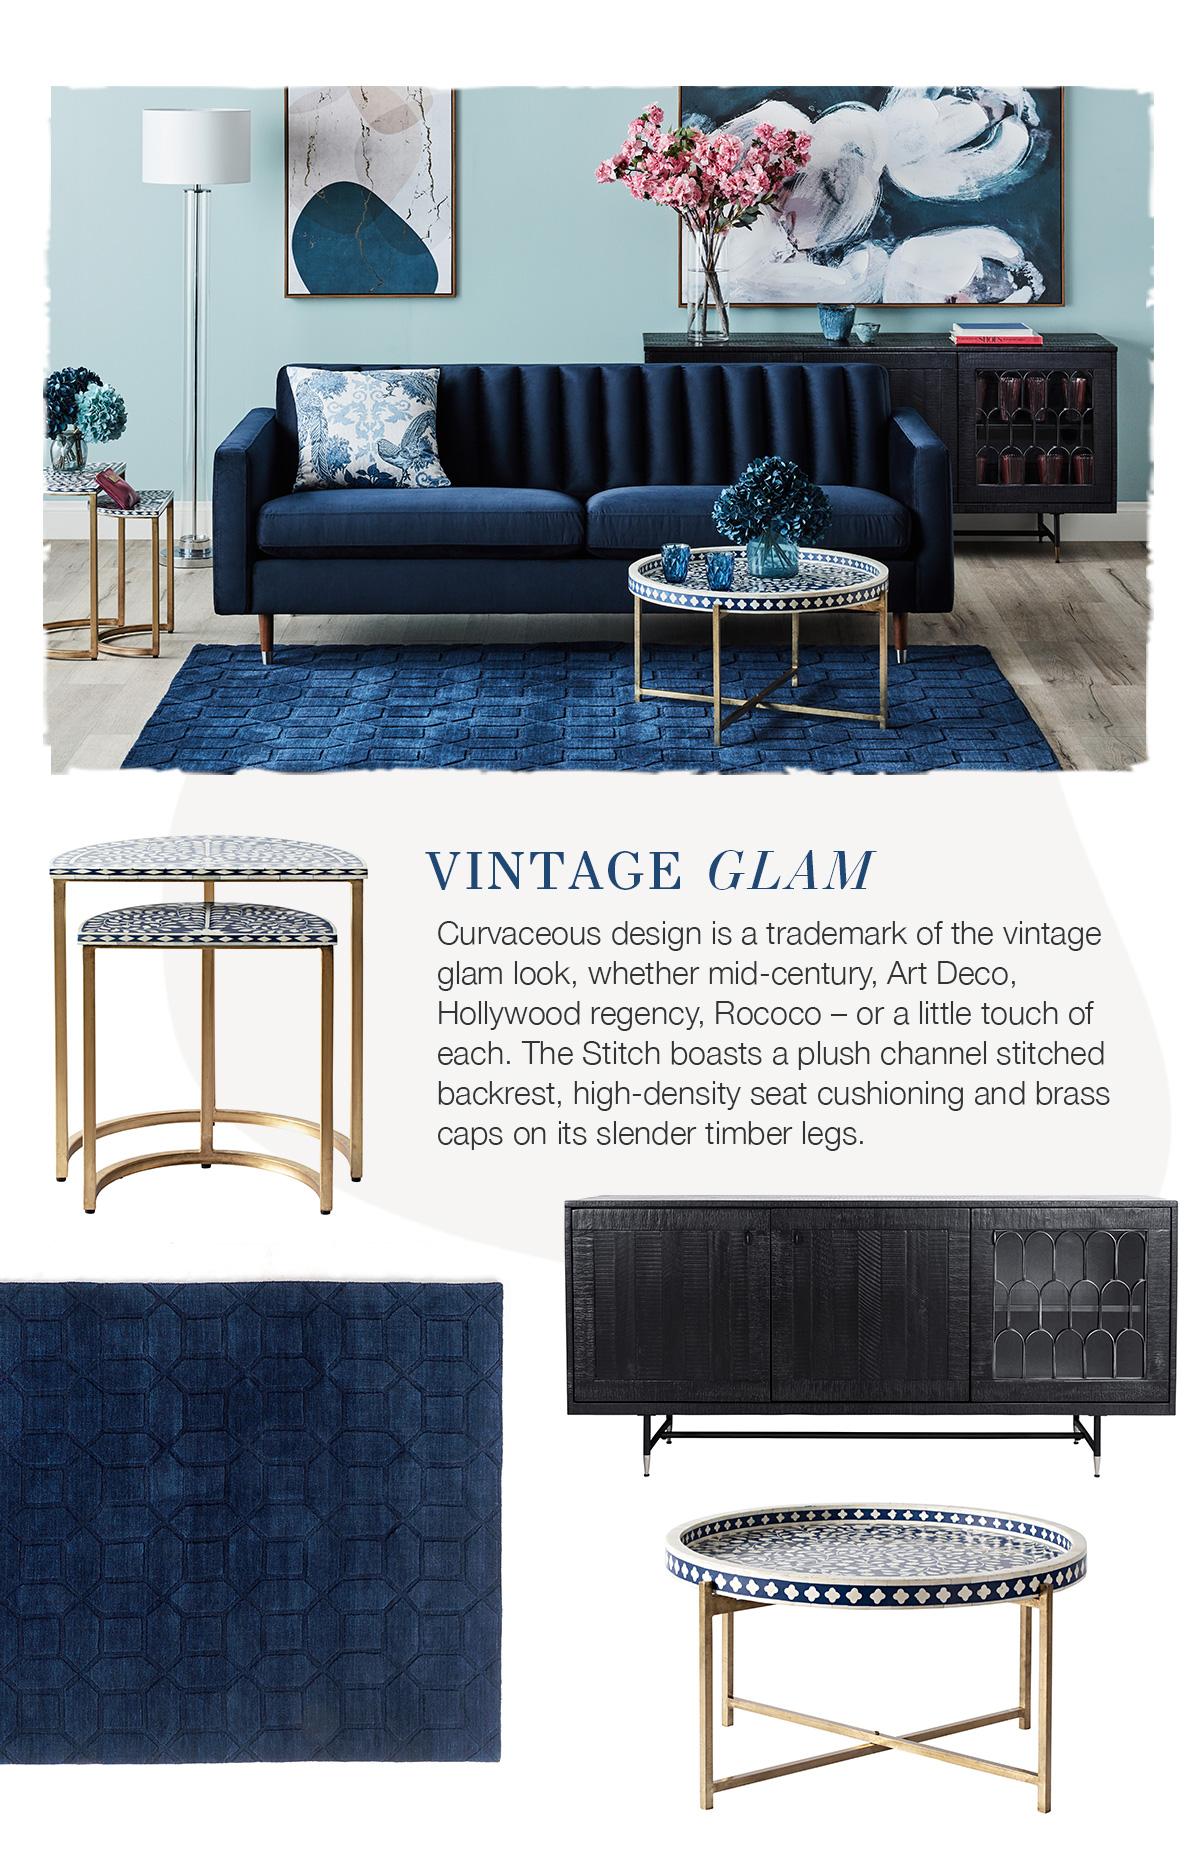 Up the Luxe with the Stitch Velvet Sofa 2 - blue velvet sofa